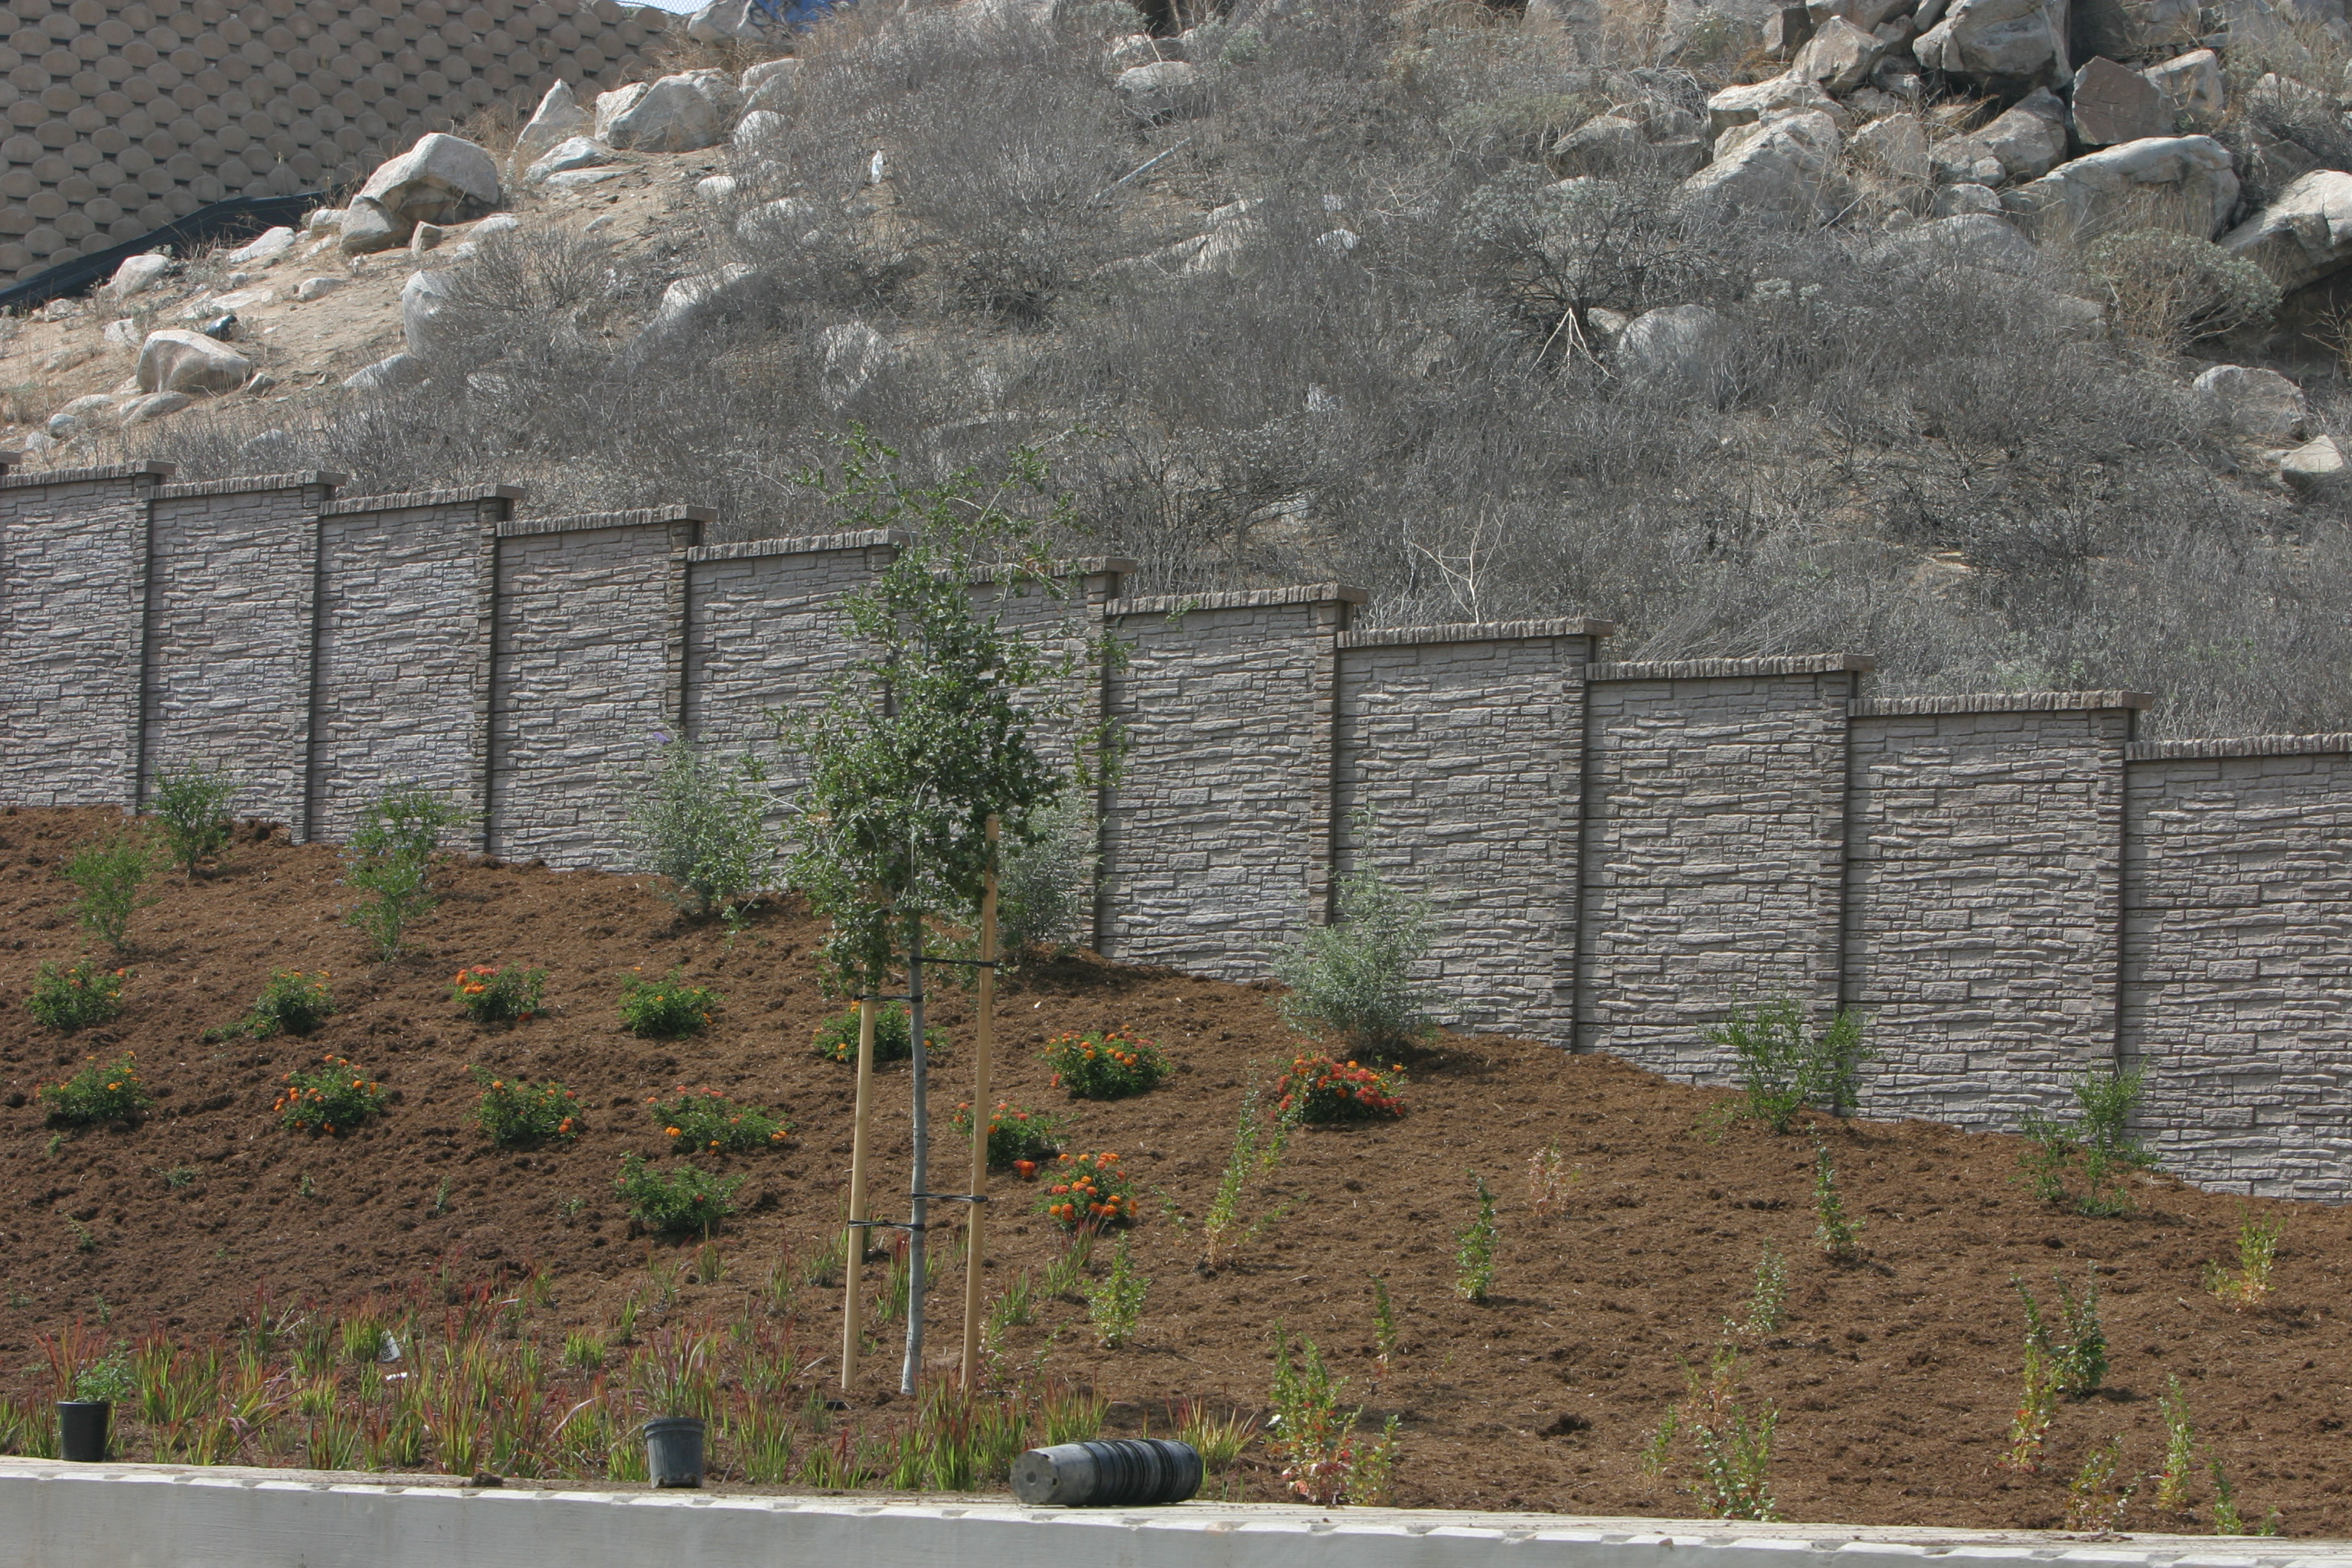 StackedStone precast fence wall